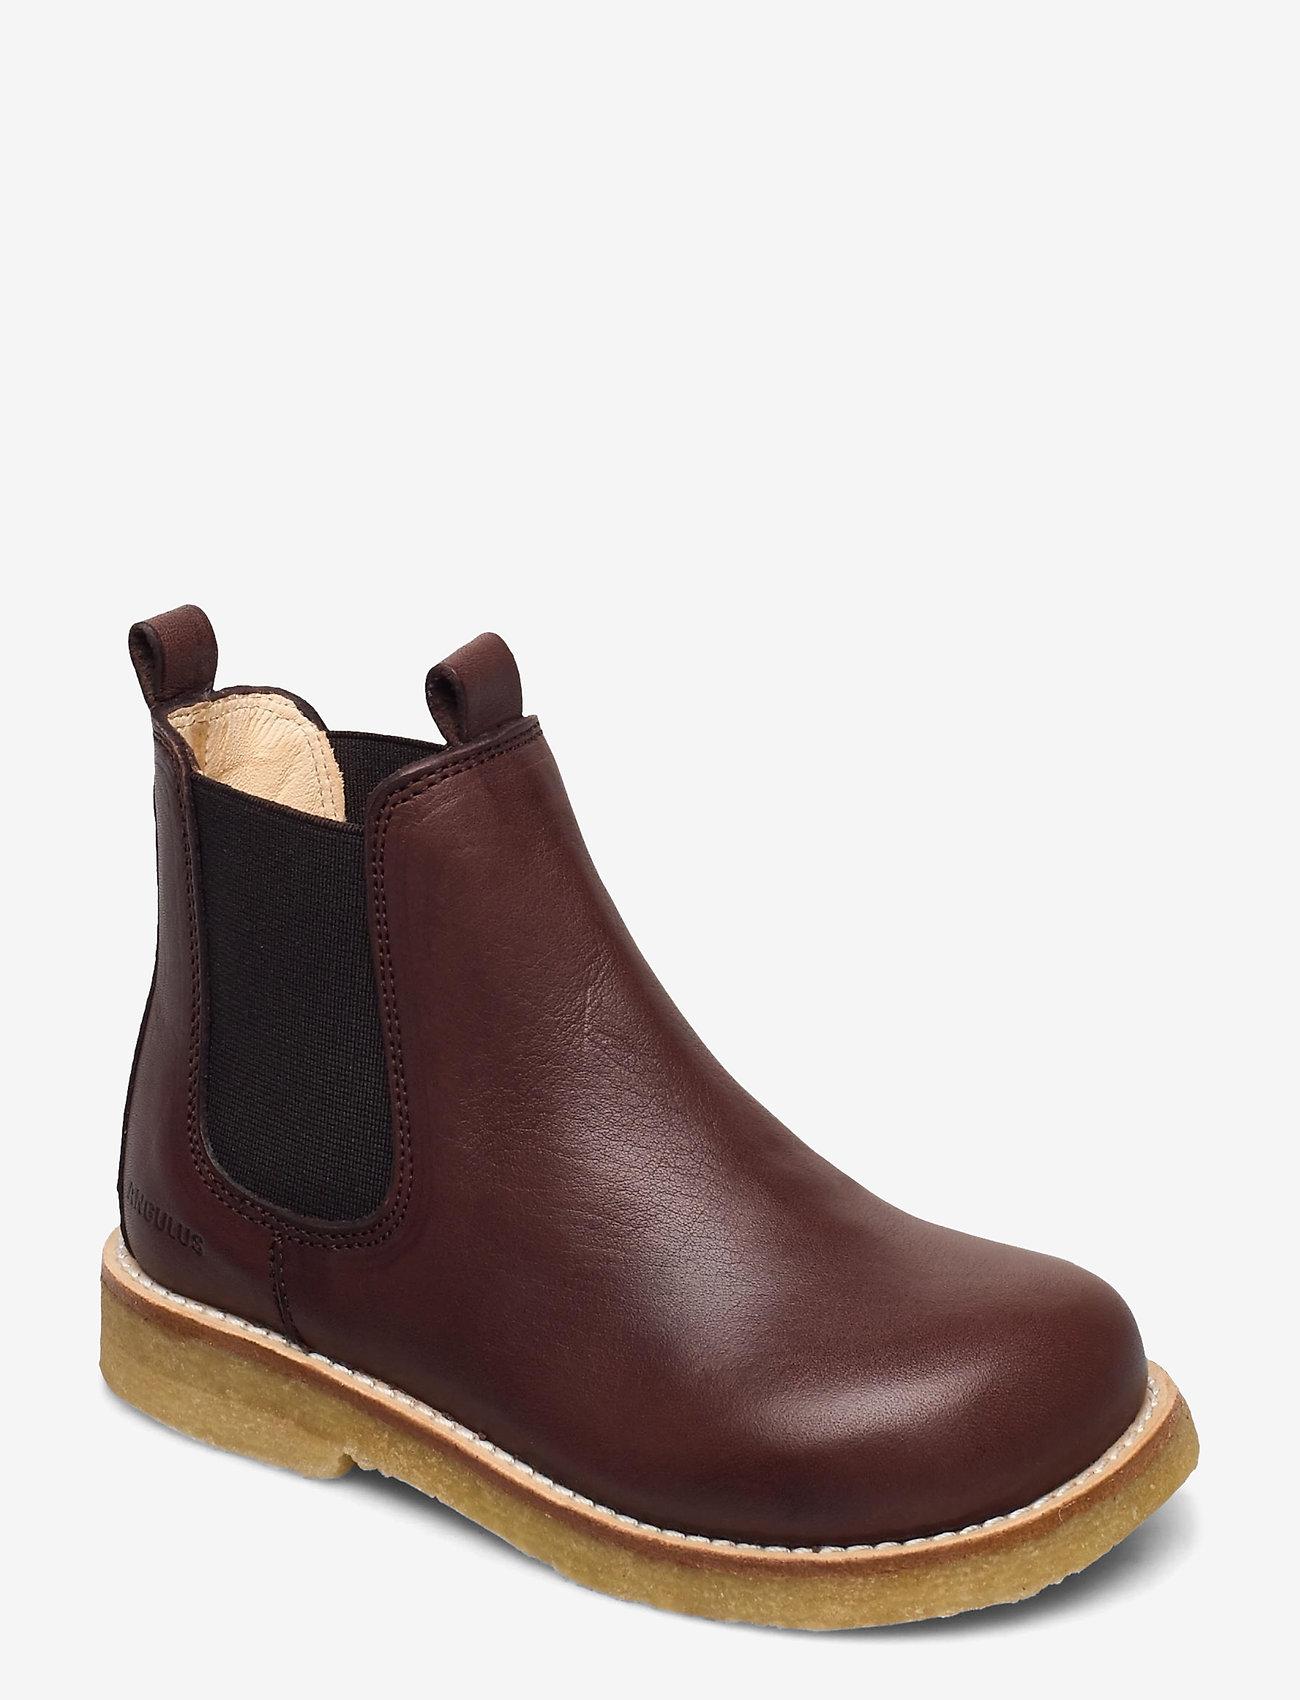 ANGULUS - Chelsea boot - sko - 1547/002 dark brown/brown - 0